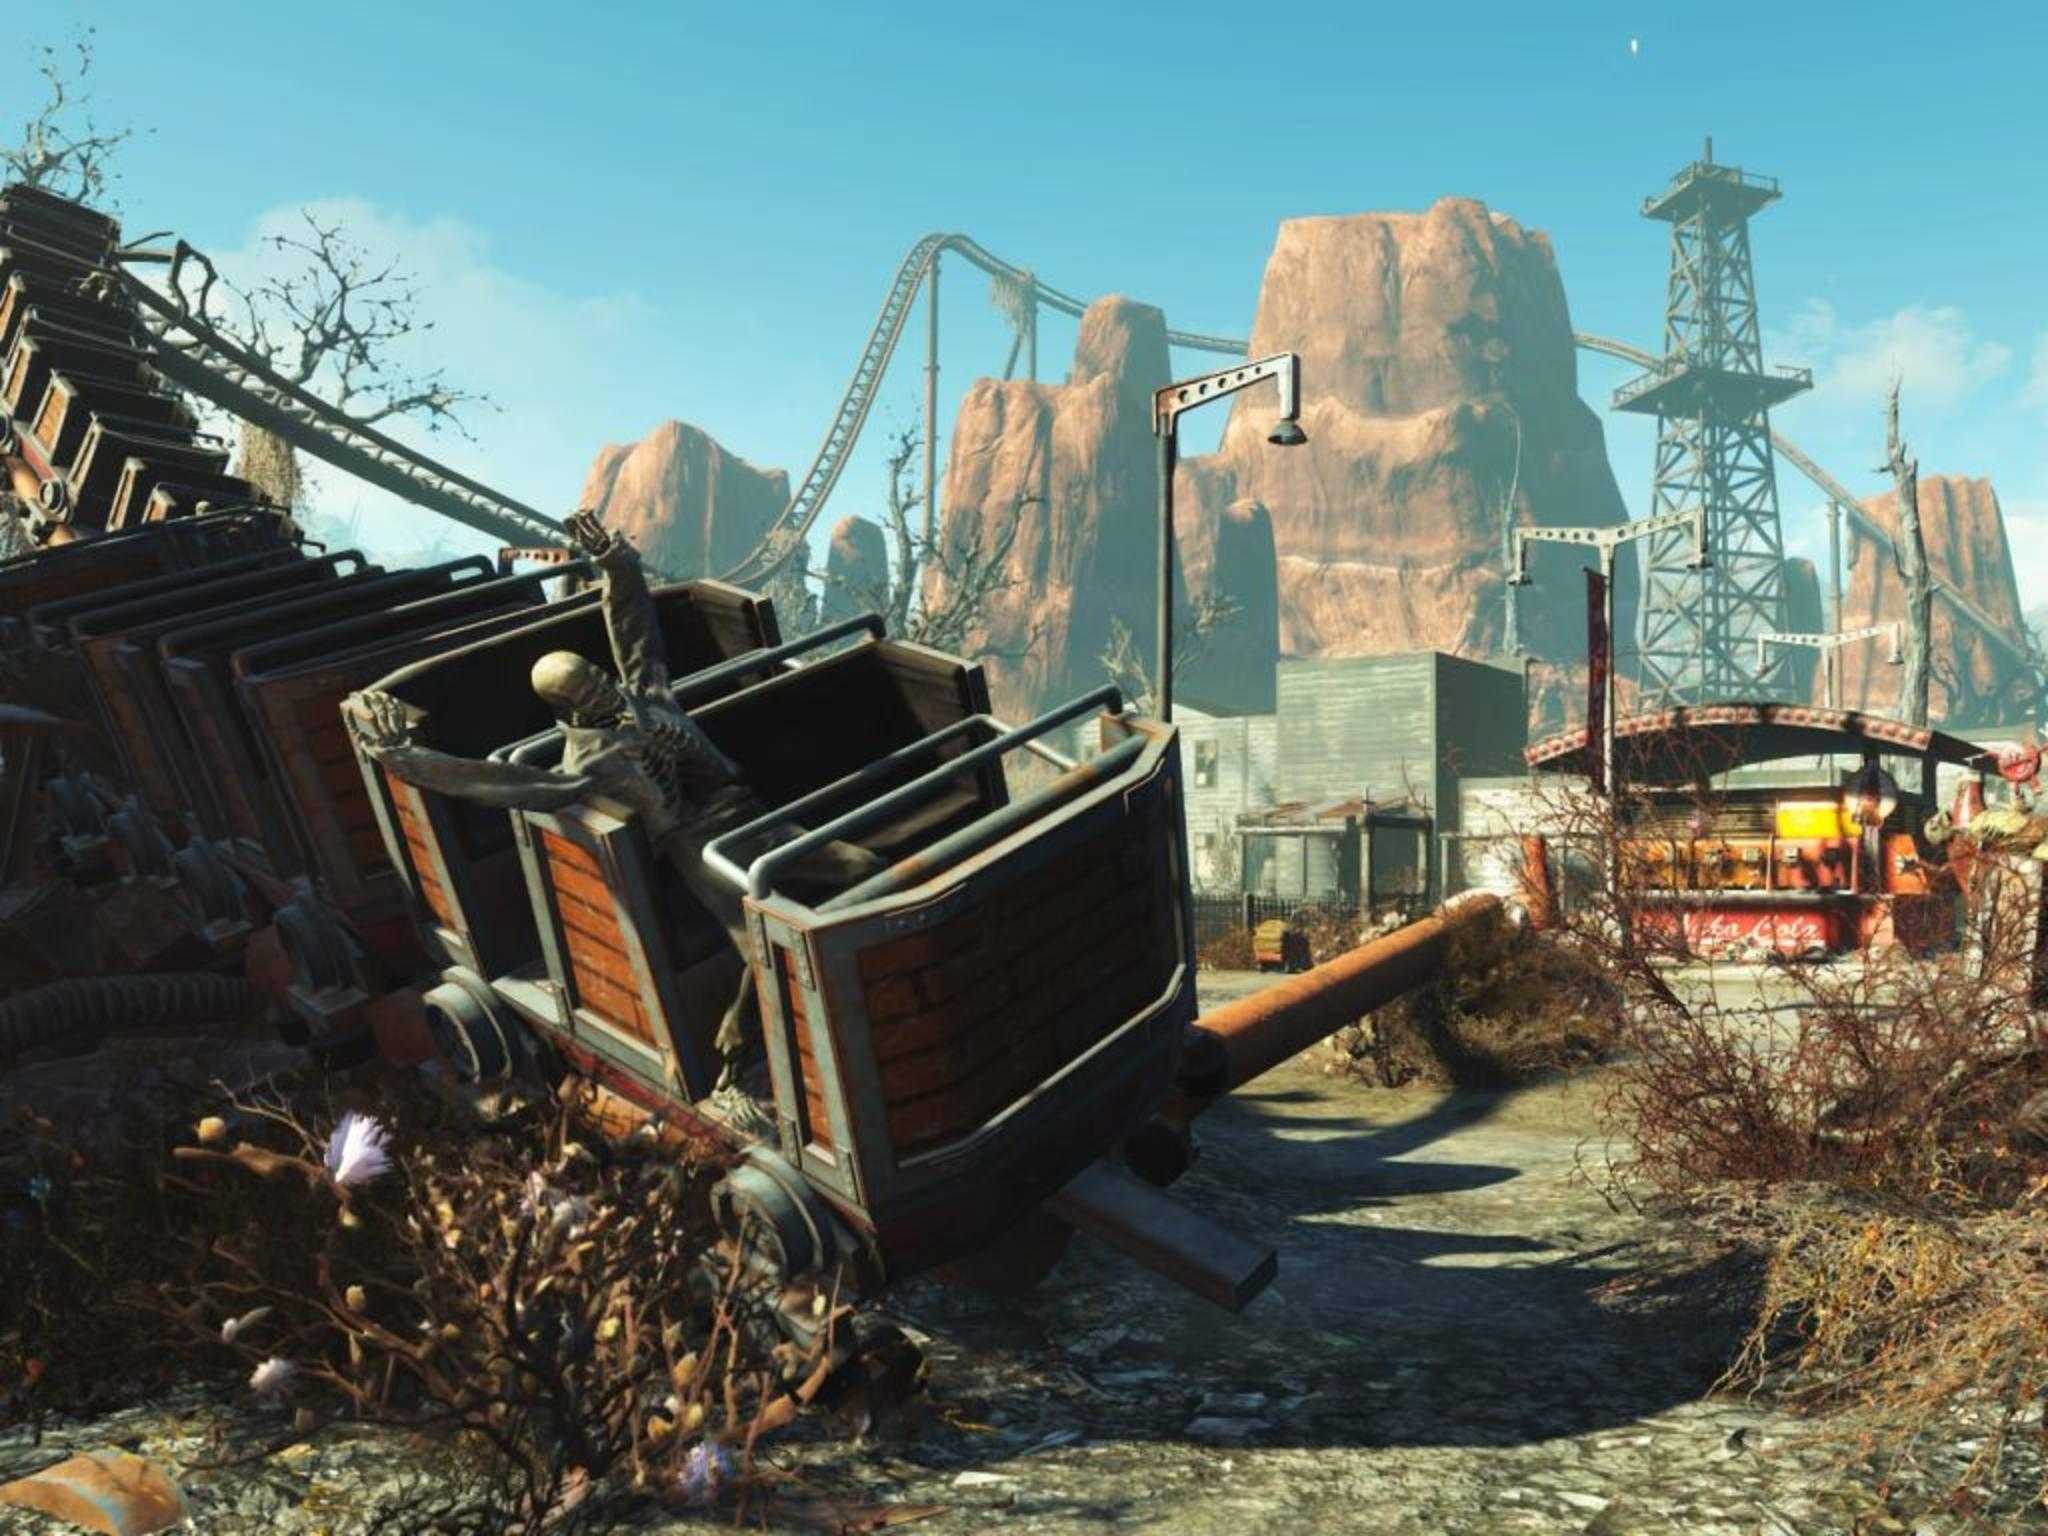 Fallout 4 Nuka World Teaser.jpg